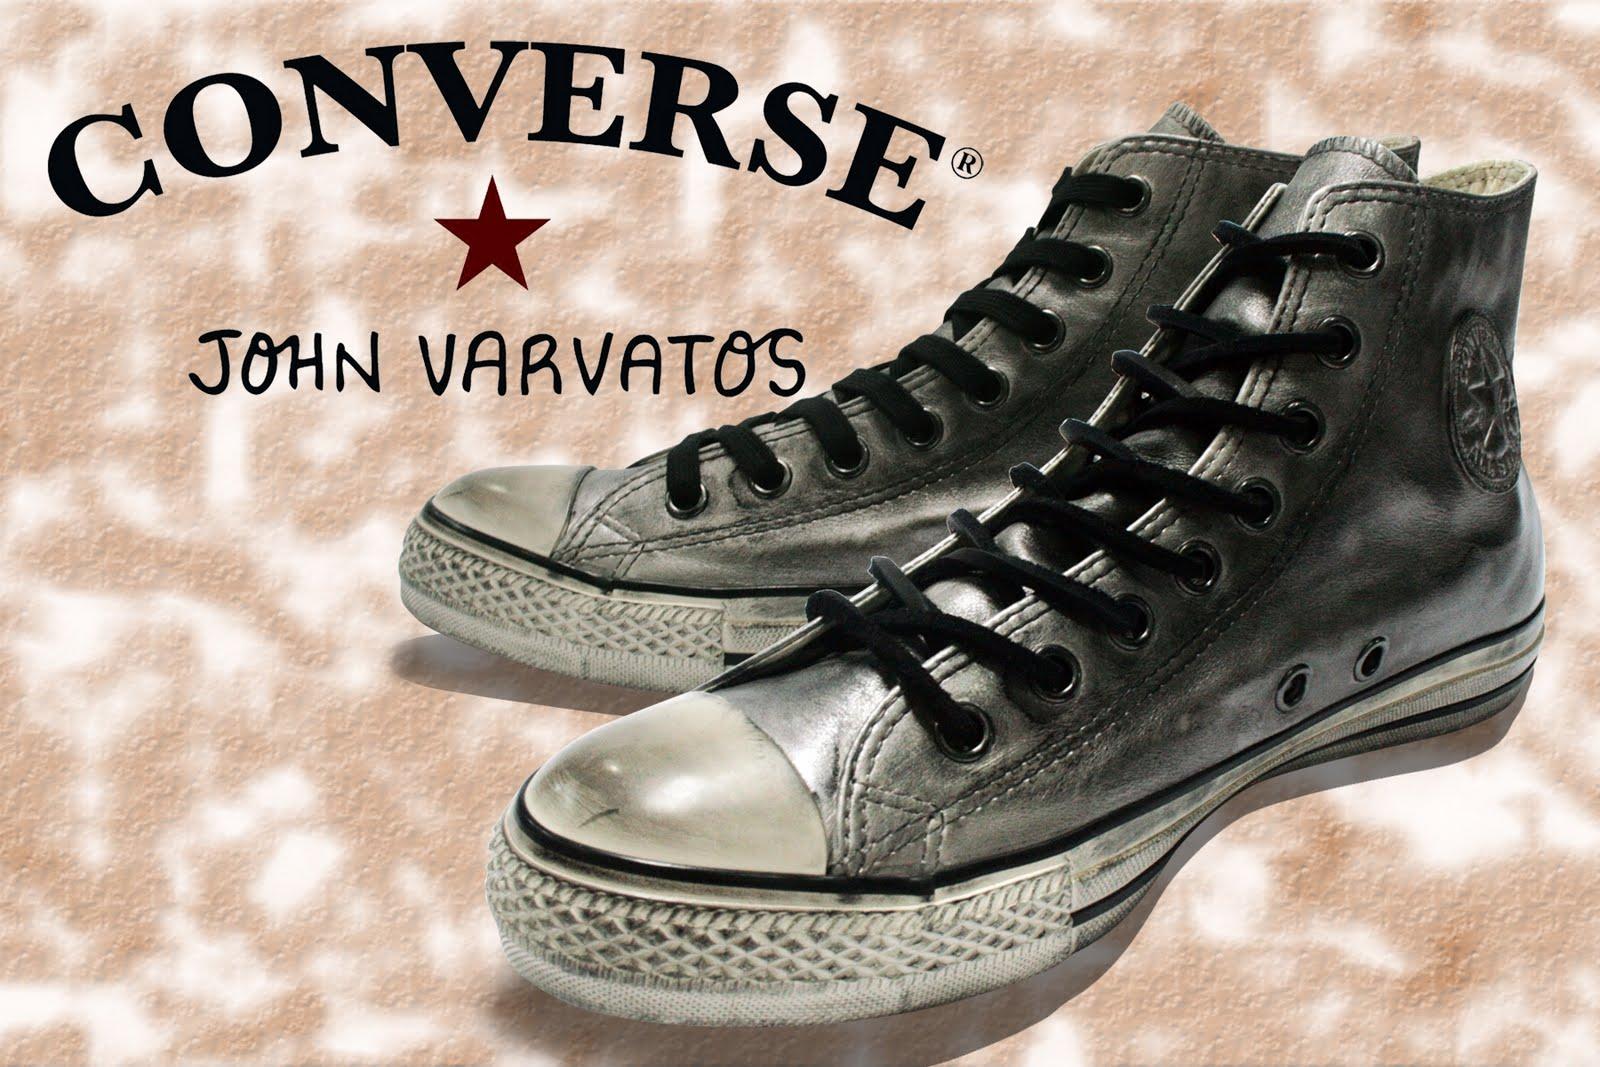 JB Personal & Biz Blog: Converse and John Varvatos Releases